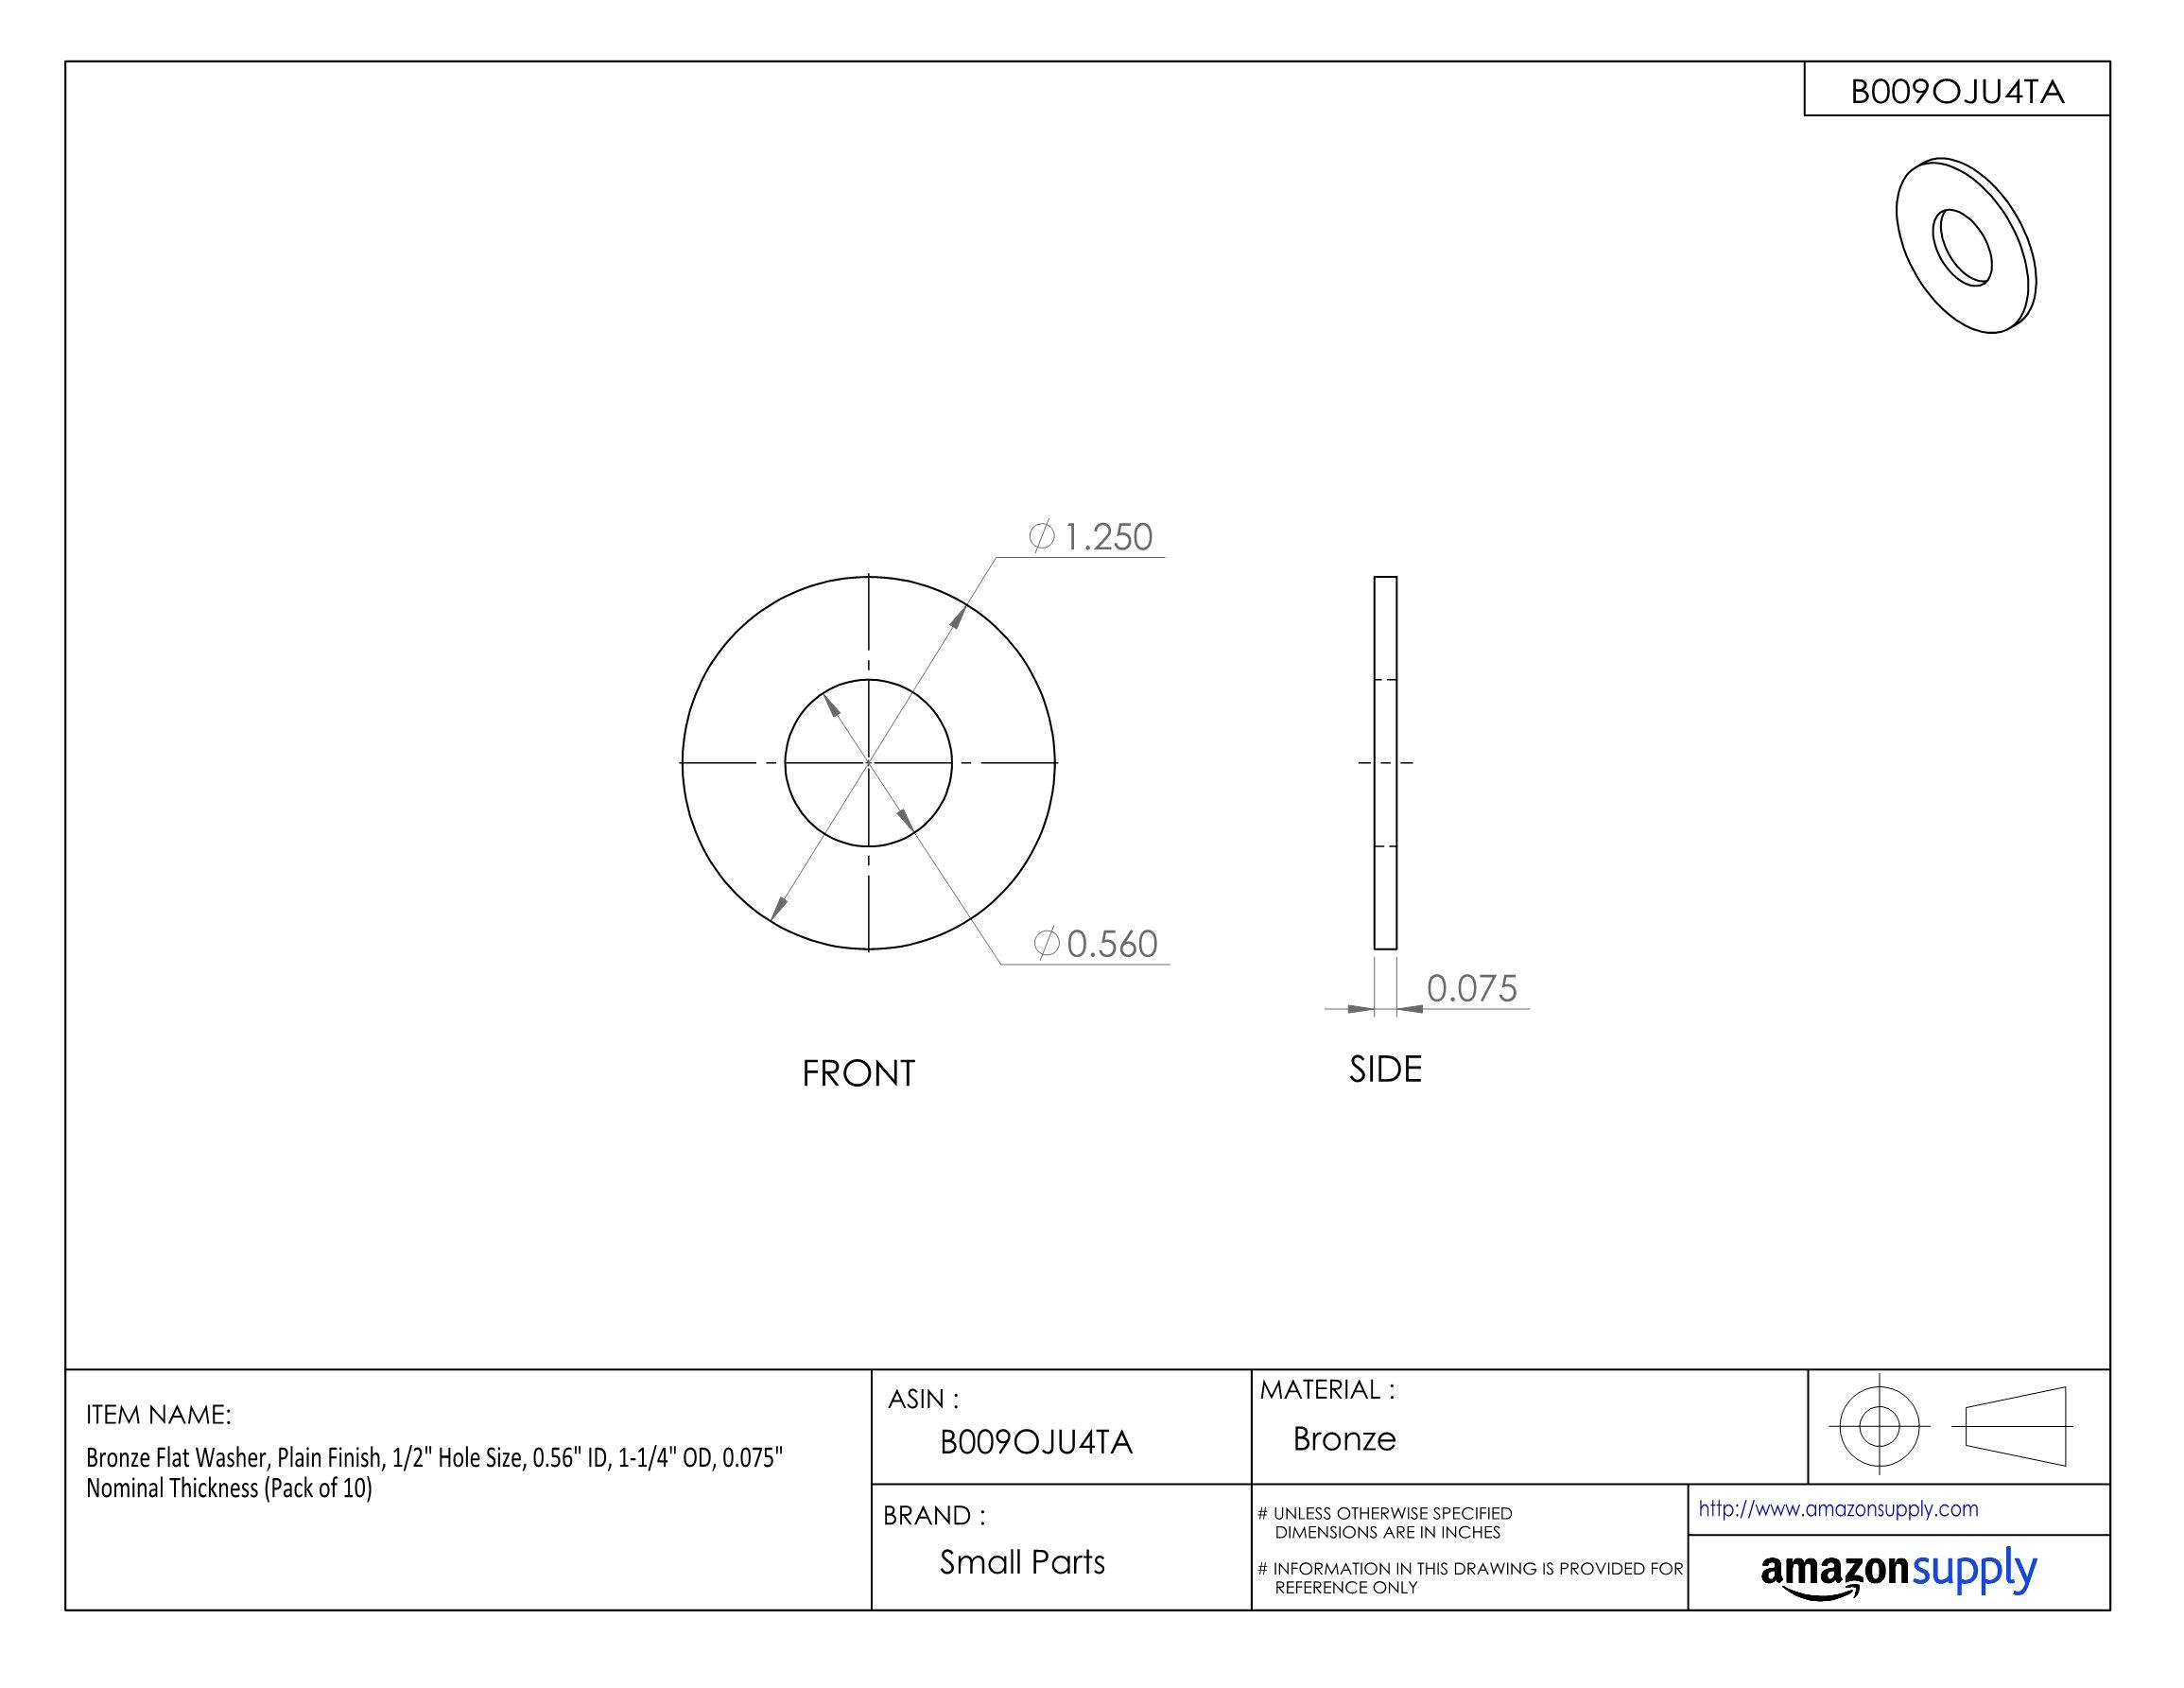 Bronze Flat Washer, Plain Finish, 1/2'' Hole Size, 0.56'' ID, 1-1/4'' OD, 0.075'' Nominal Thickness (Pack of 10)